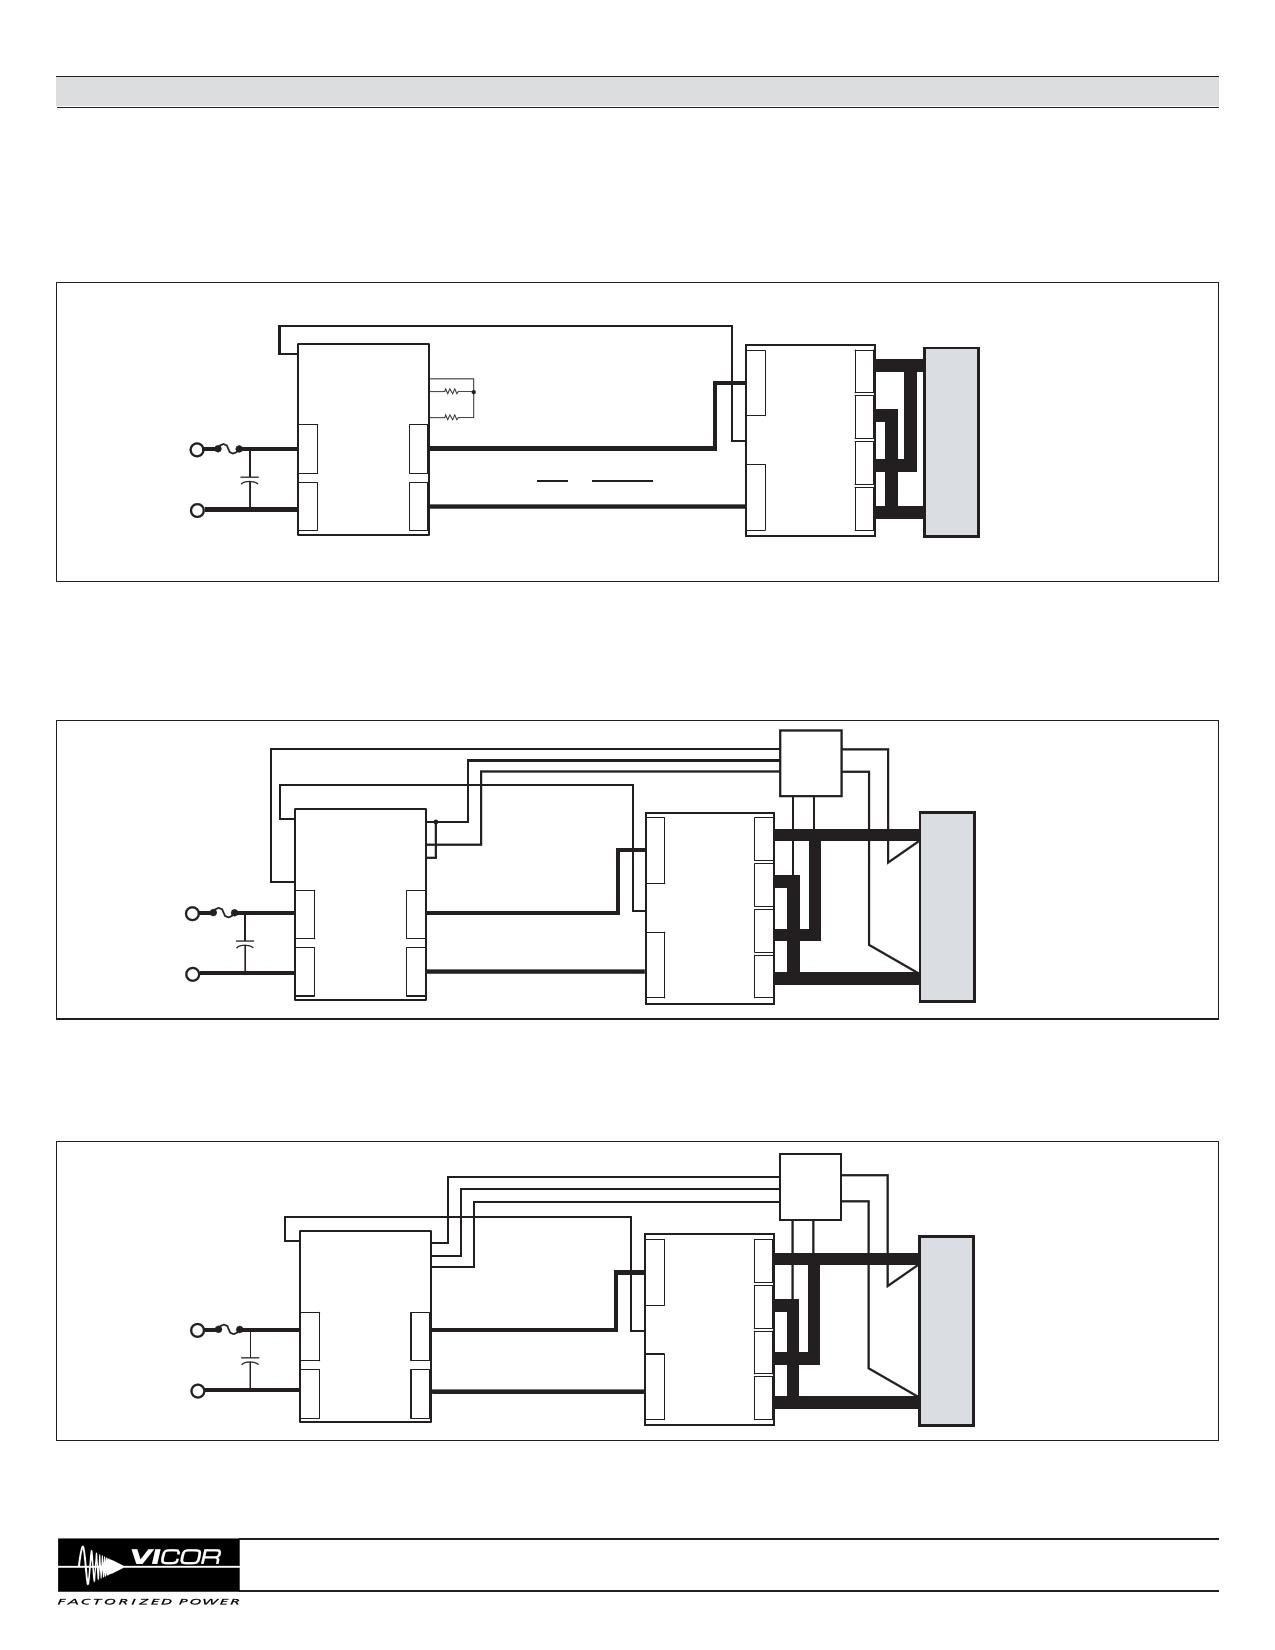 V048K160T015 pdf, datenblatt